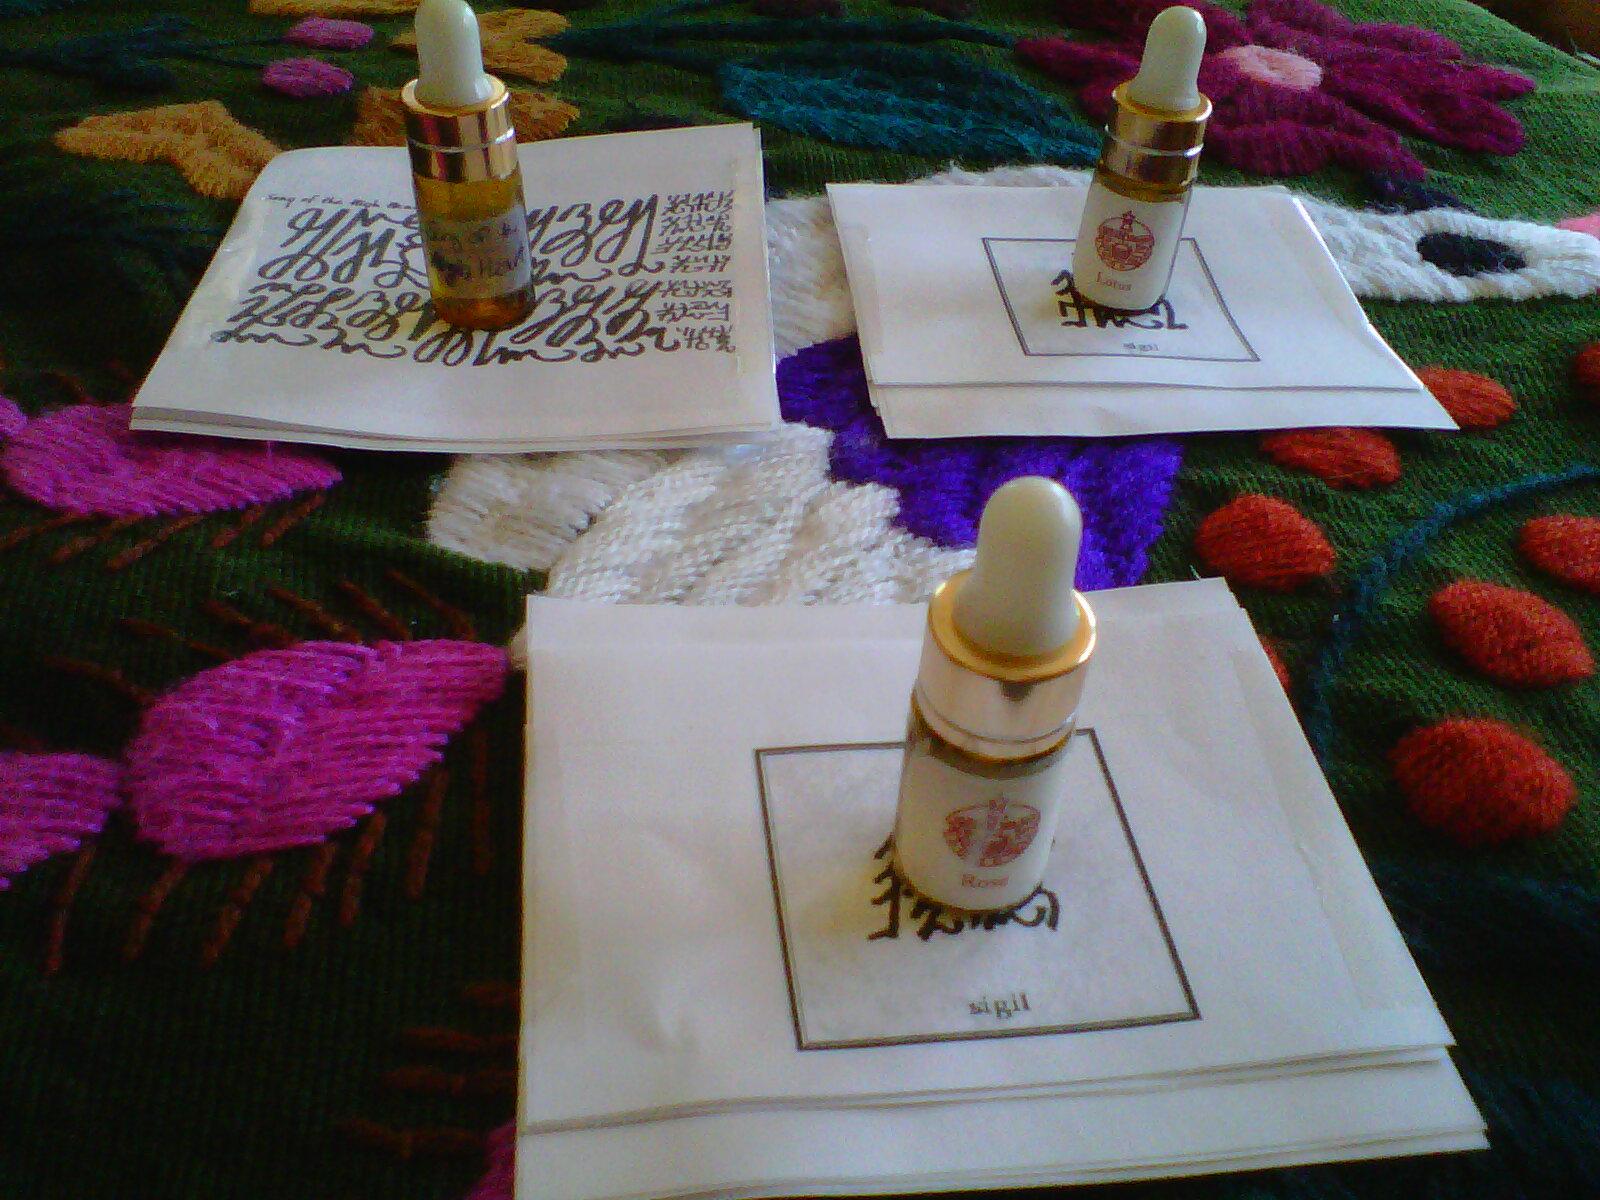 3 resurrection oils